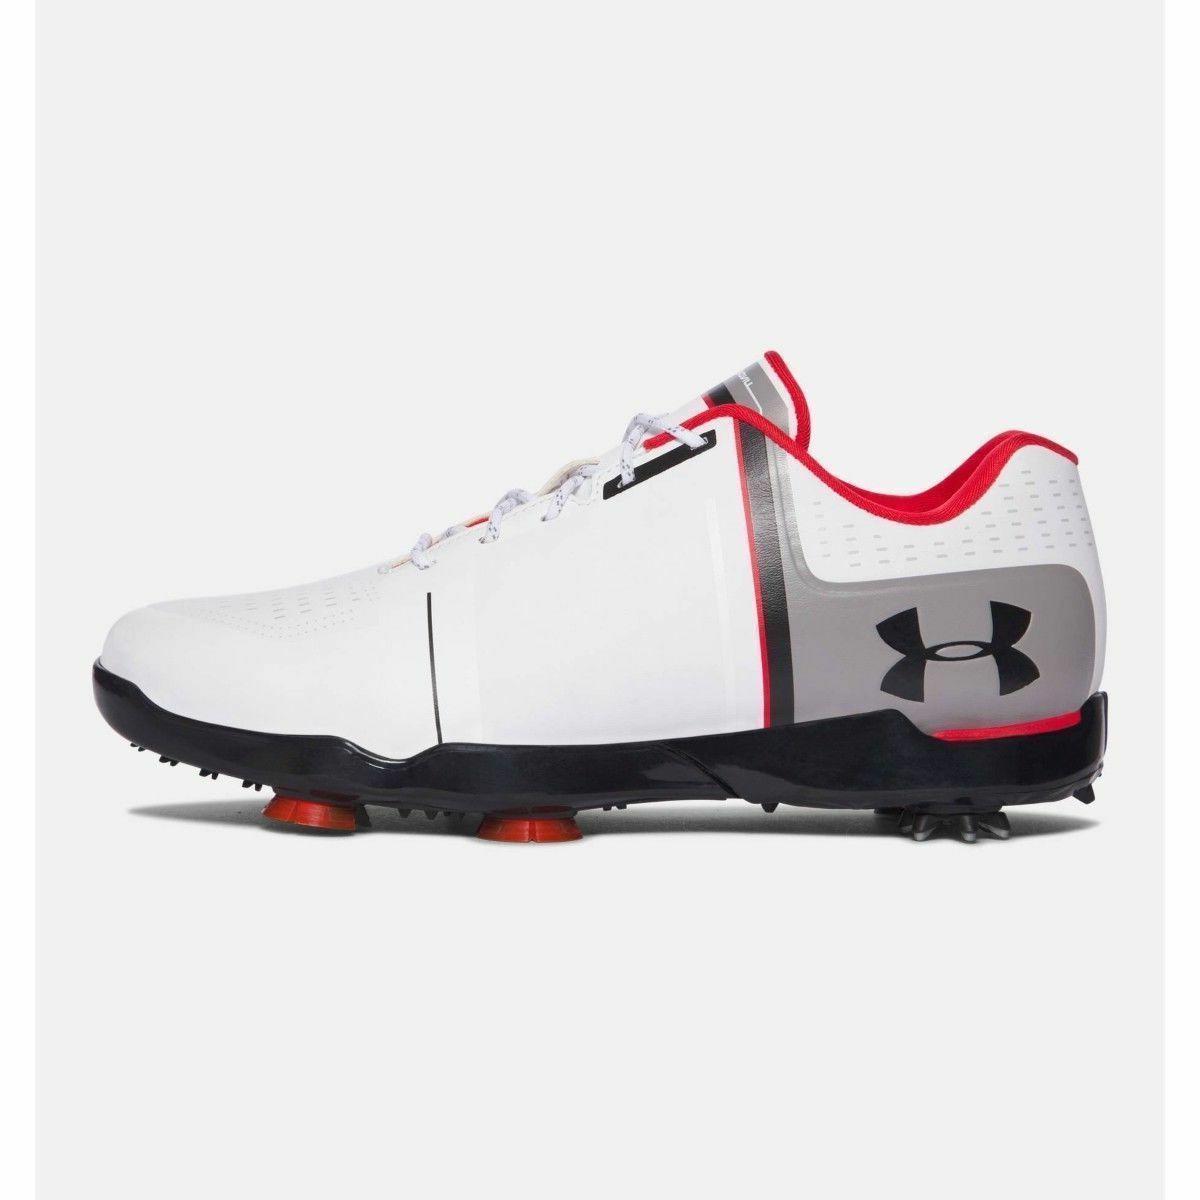 ua spieth one jr golf shoes size